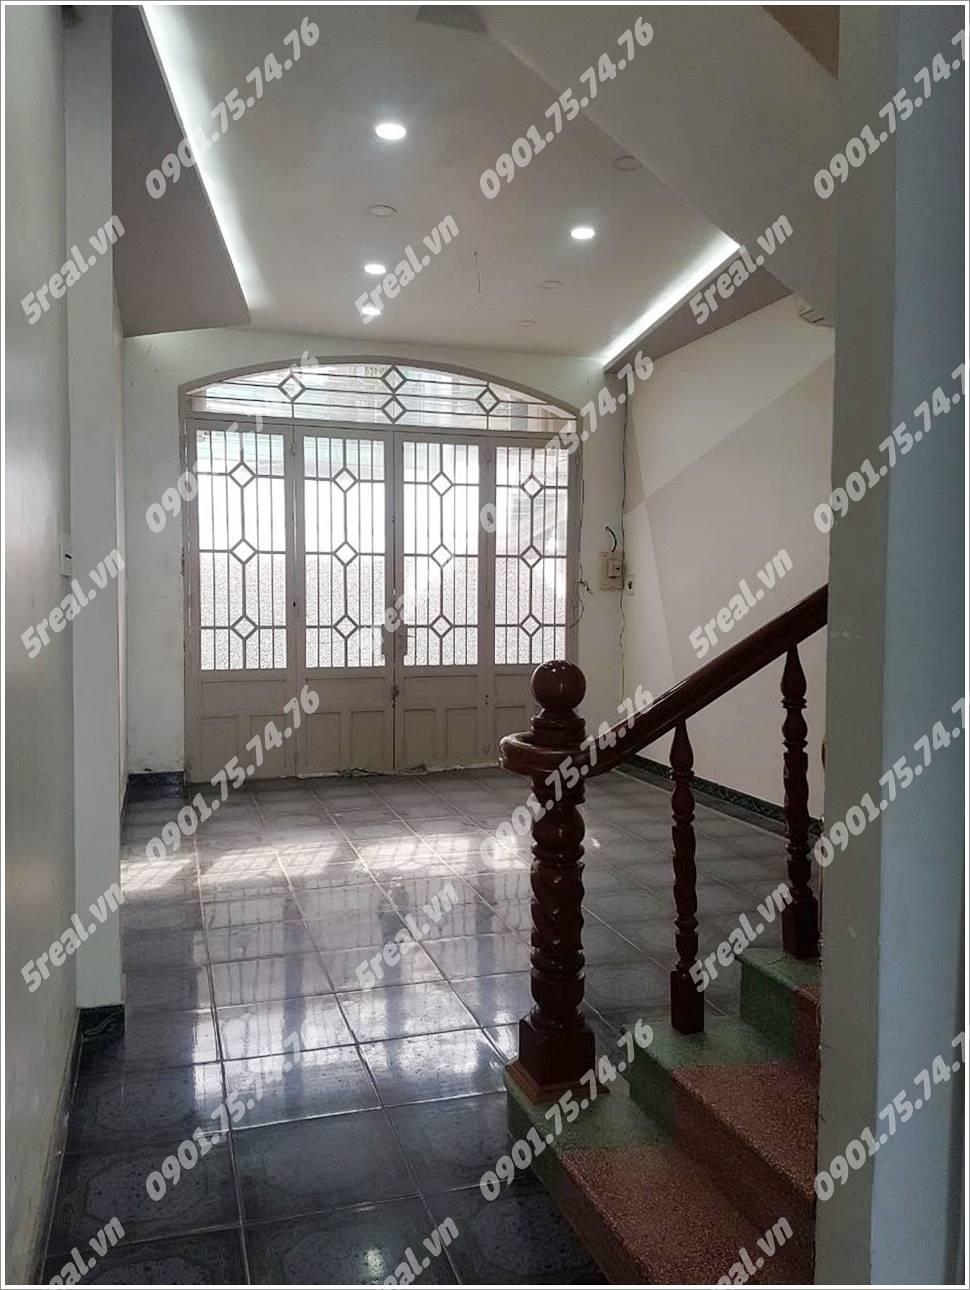 doo-building-nguyen-van-qua-quan-12-van-phong-cho-thue-5real.vn-02